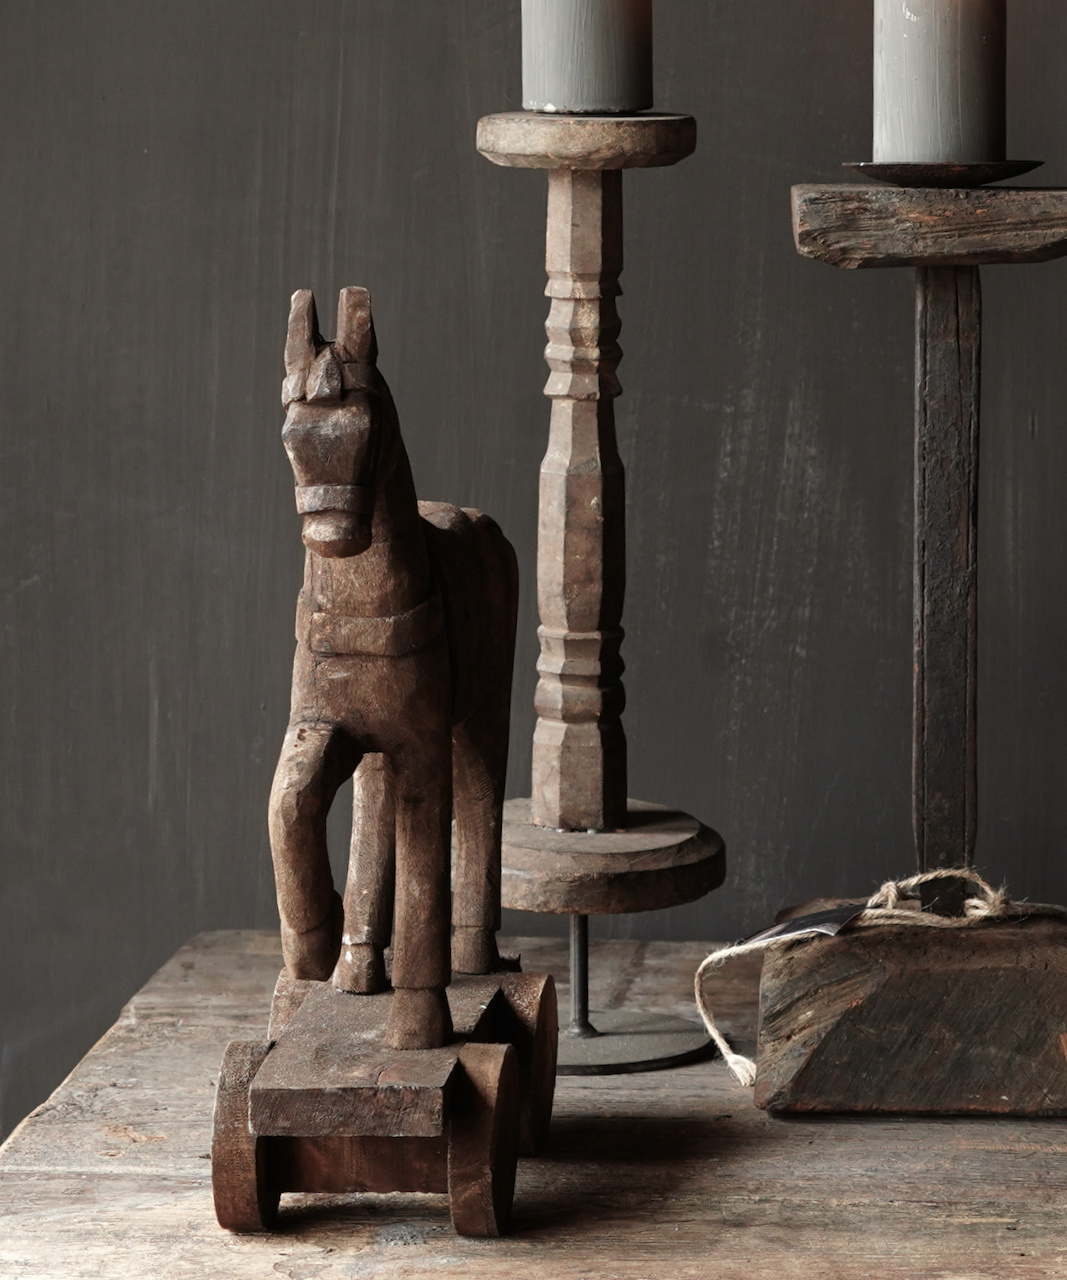 Holzpferd handgefertigt aus altem Holz-5